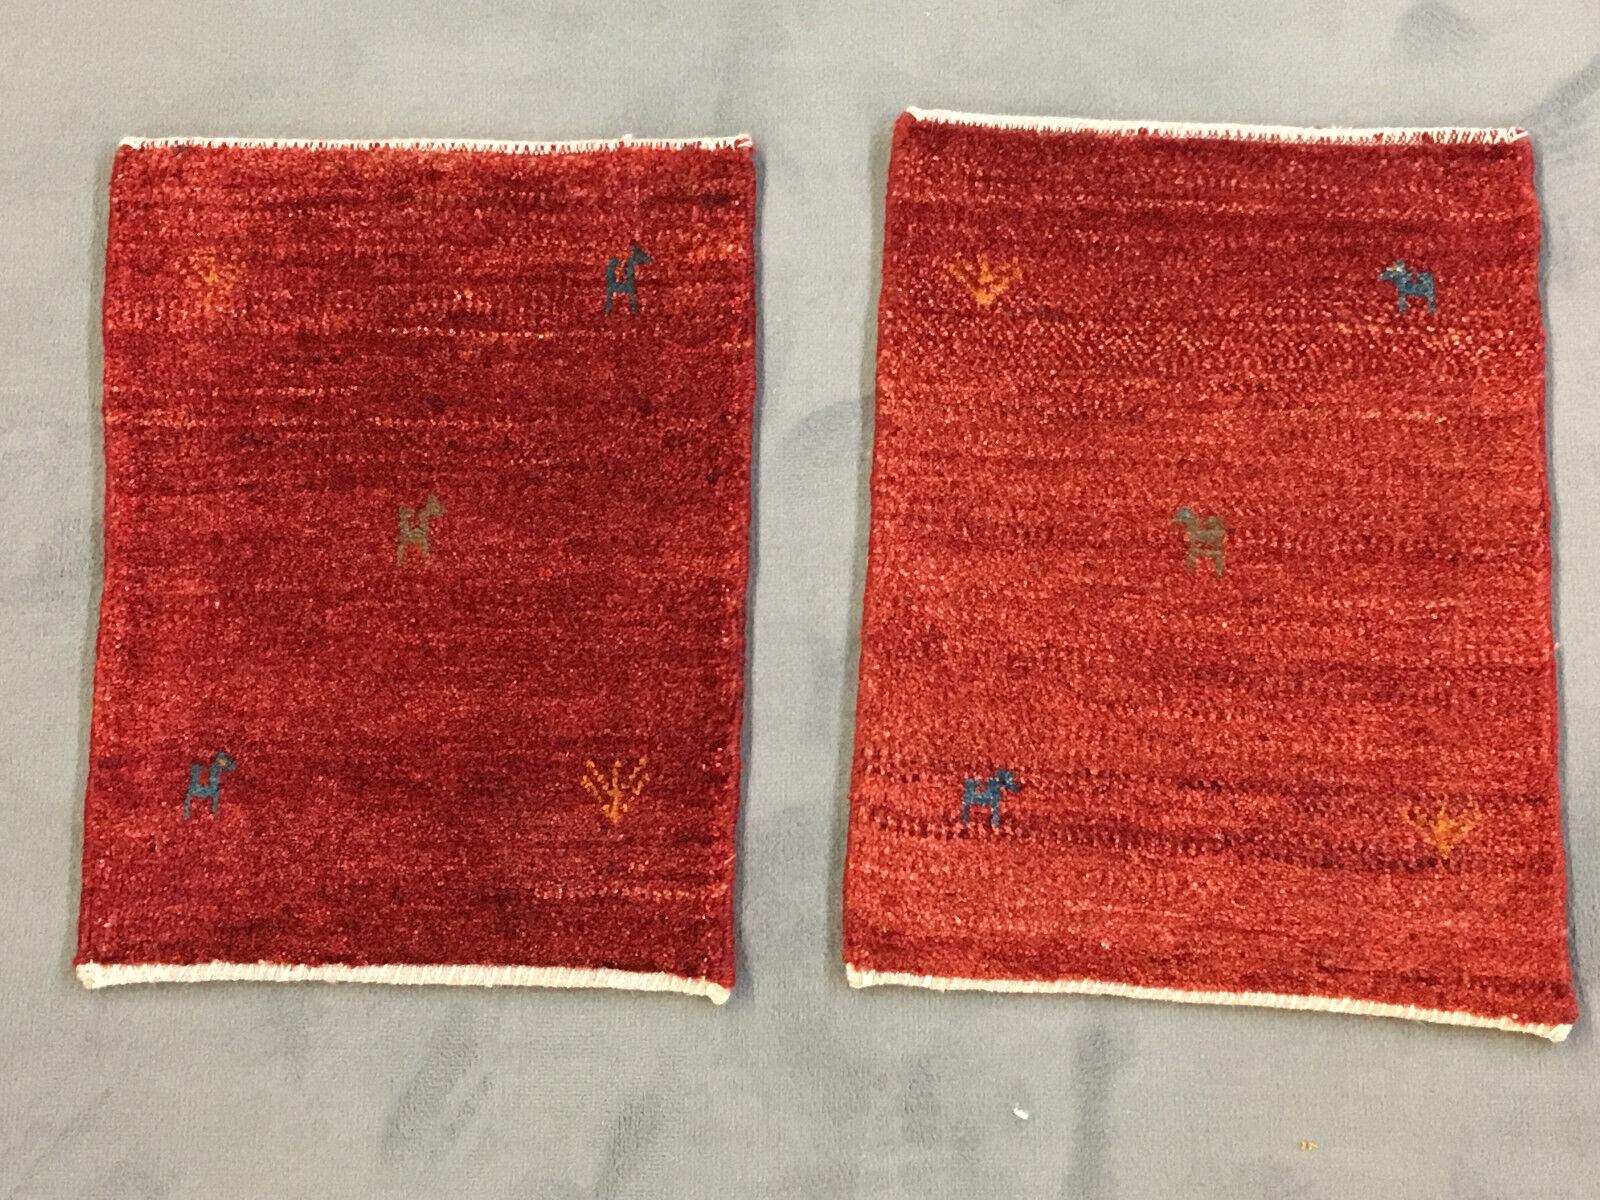 2 x veri yalamehbaff ROSSO Tappeti orientali Persiani Top (circa 55x40cm) NUOVO